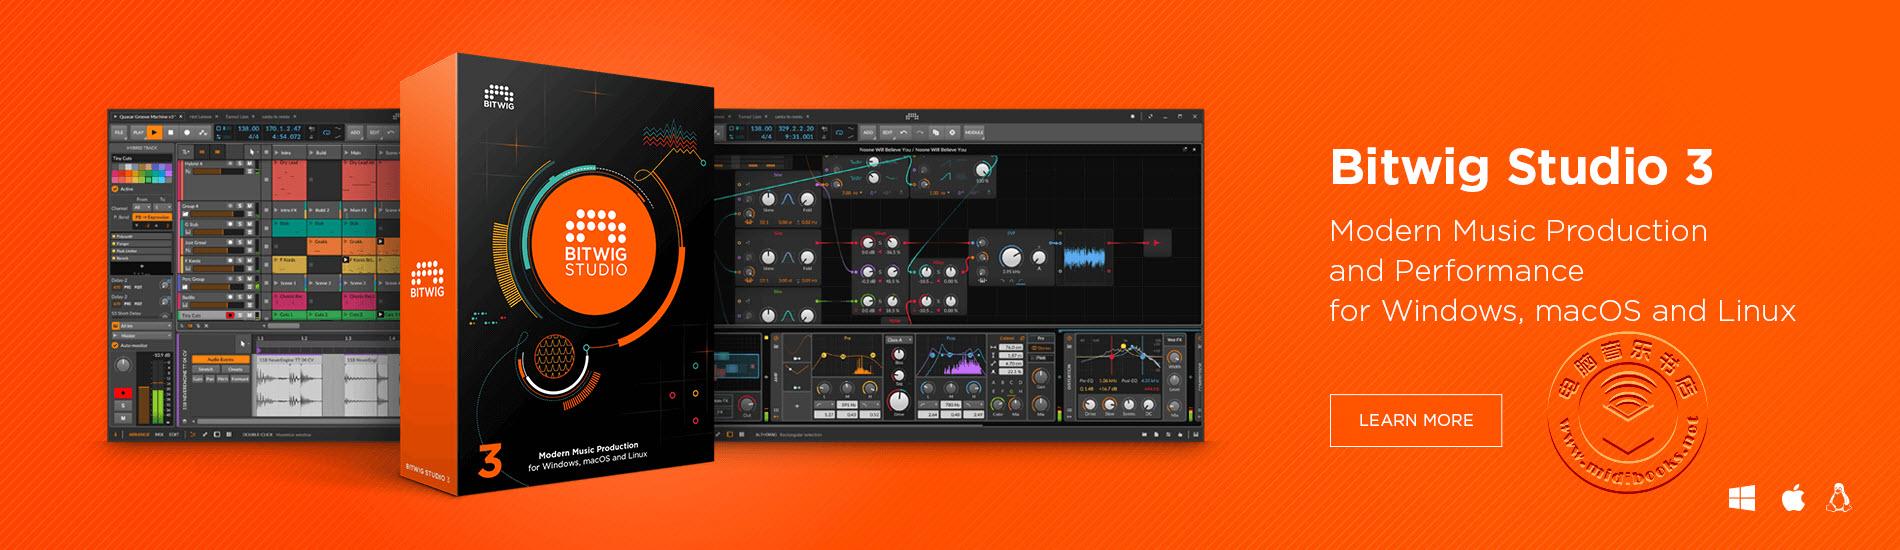 Bitwig Studio 3.2版发布,对声音的把控增强(视频)